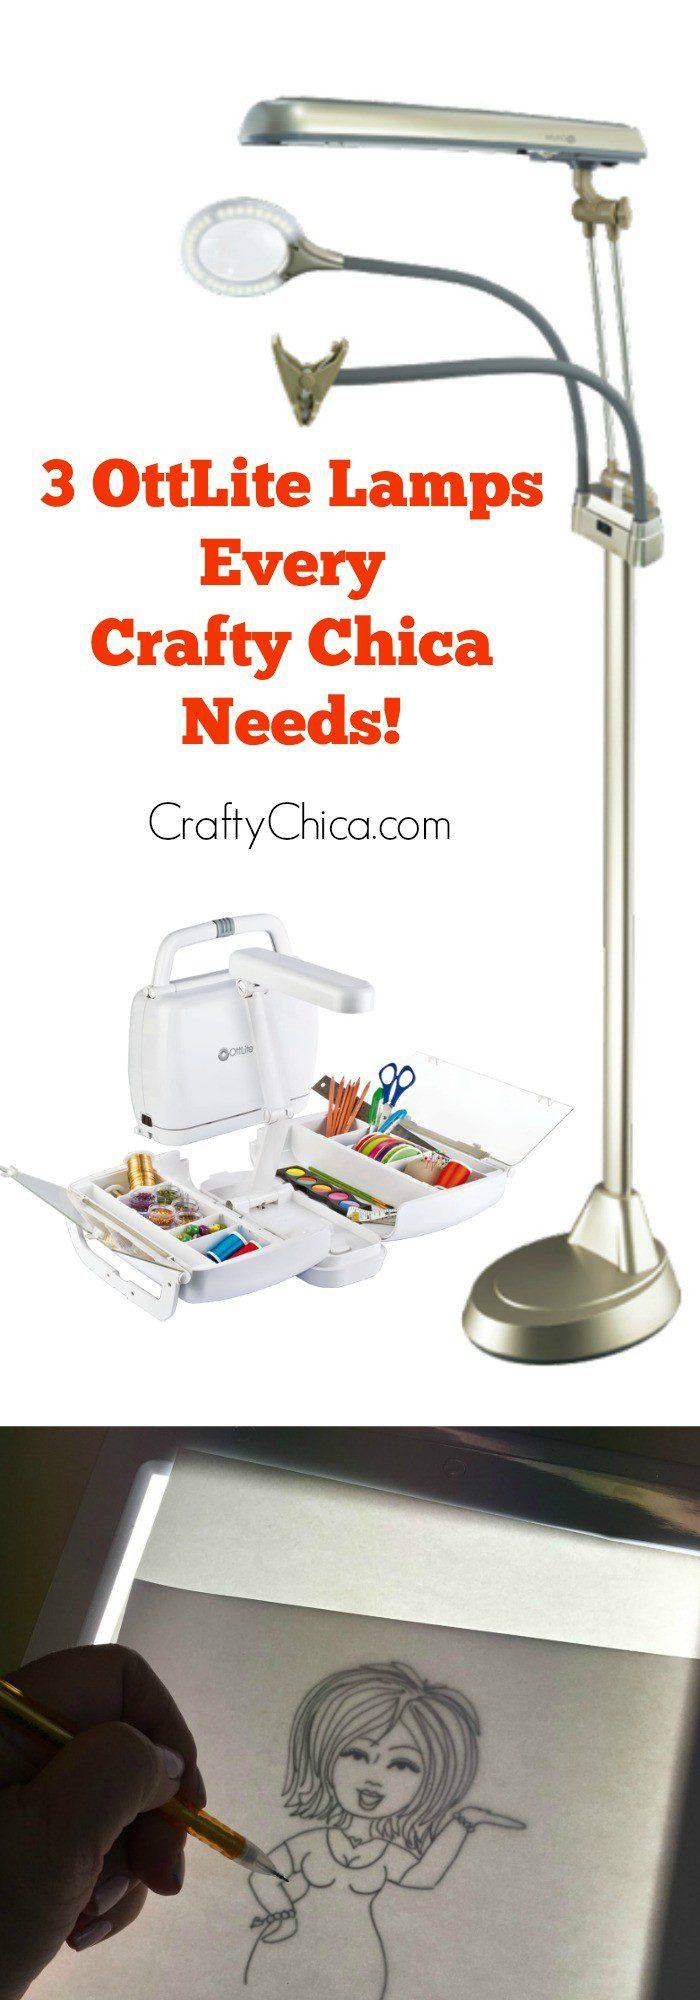 ottlite-crafty-chica